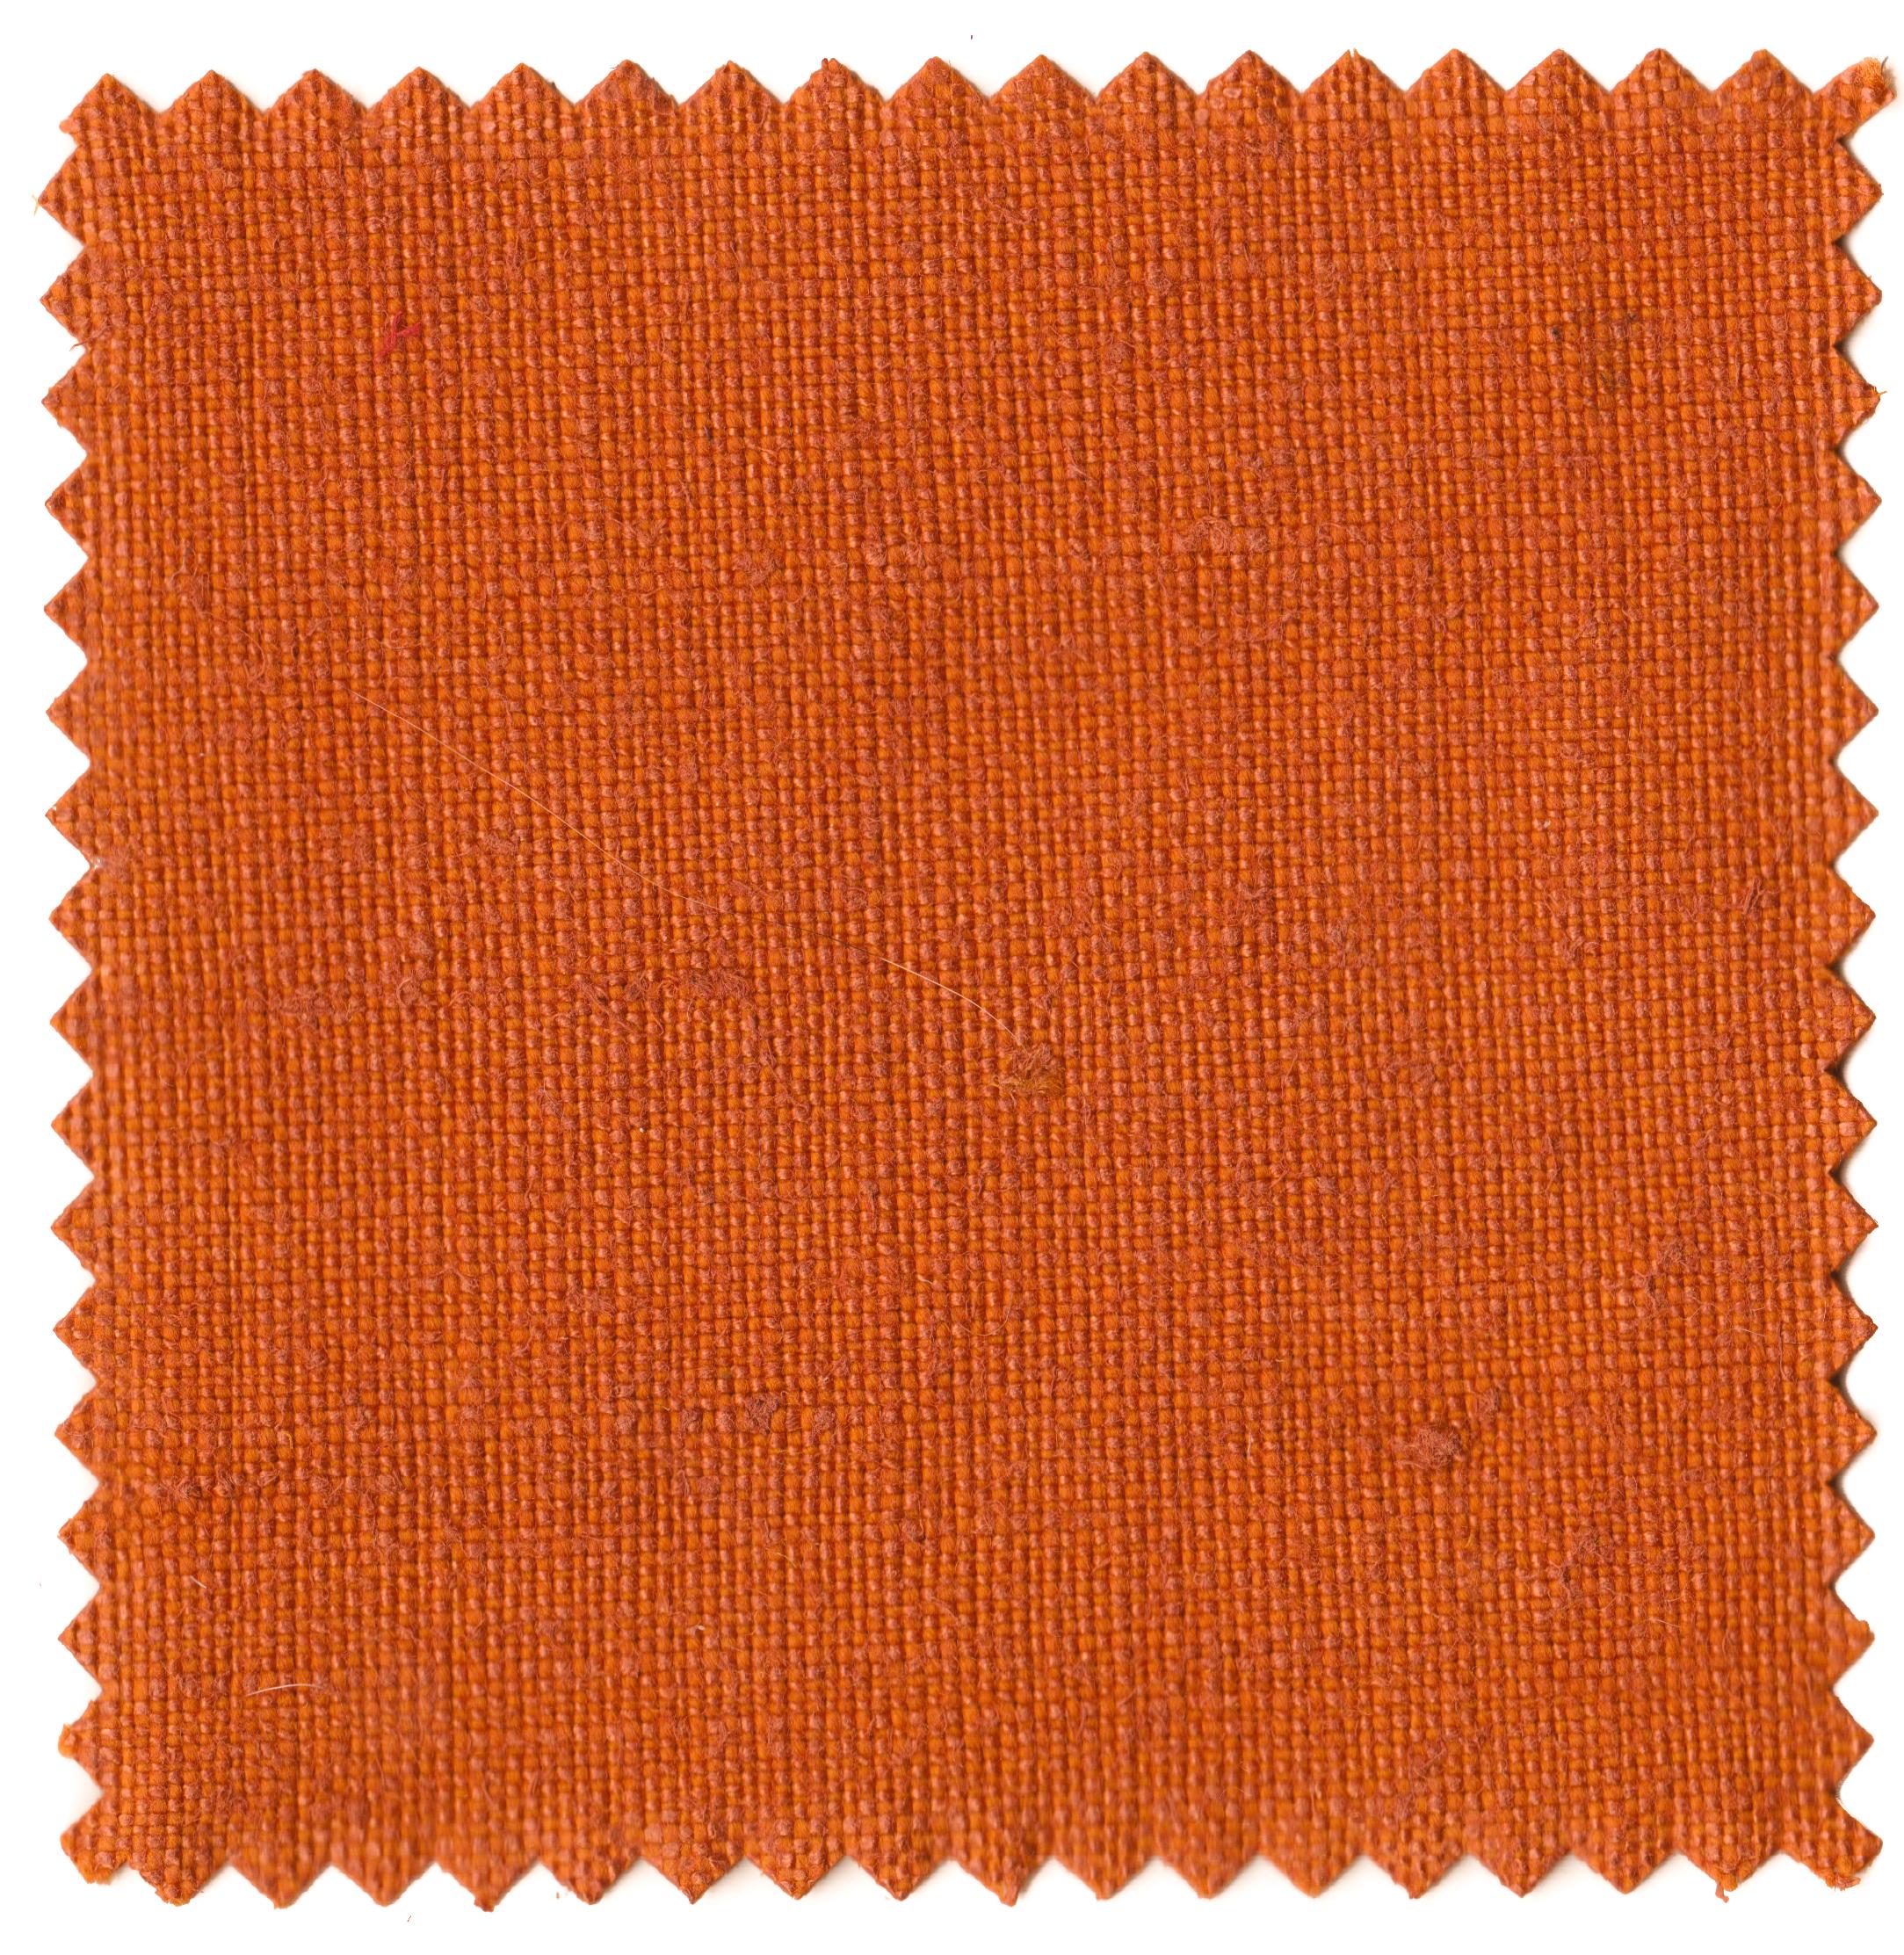 Saffron Umbers-5.jpg